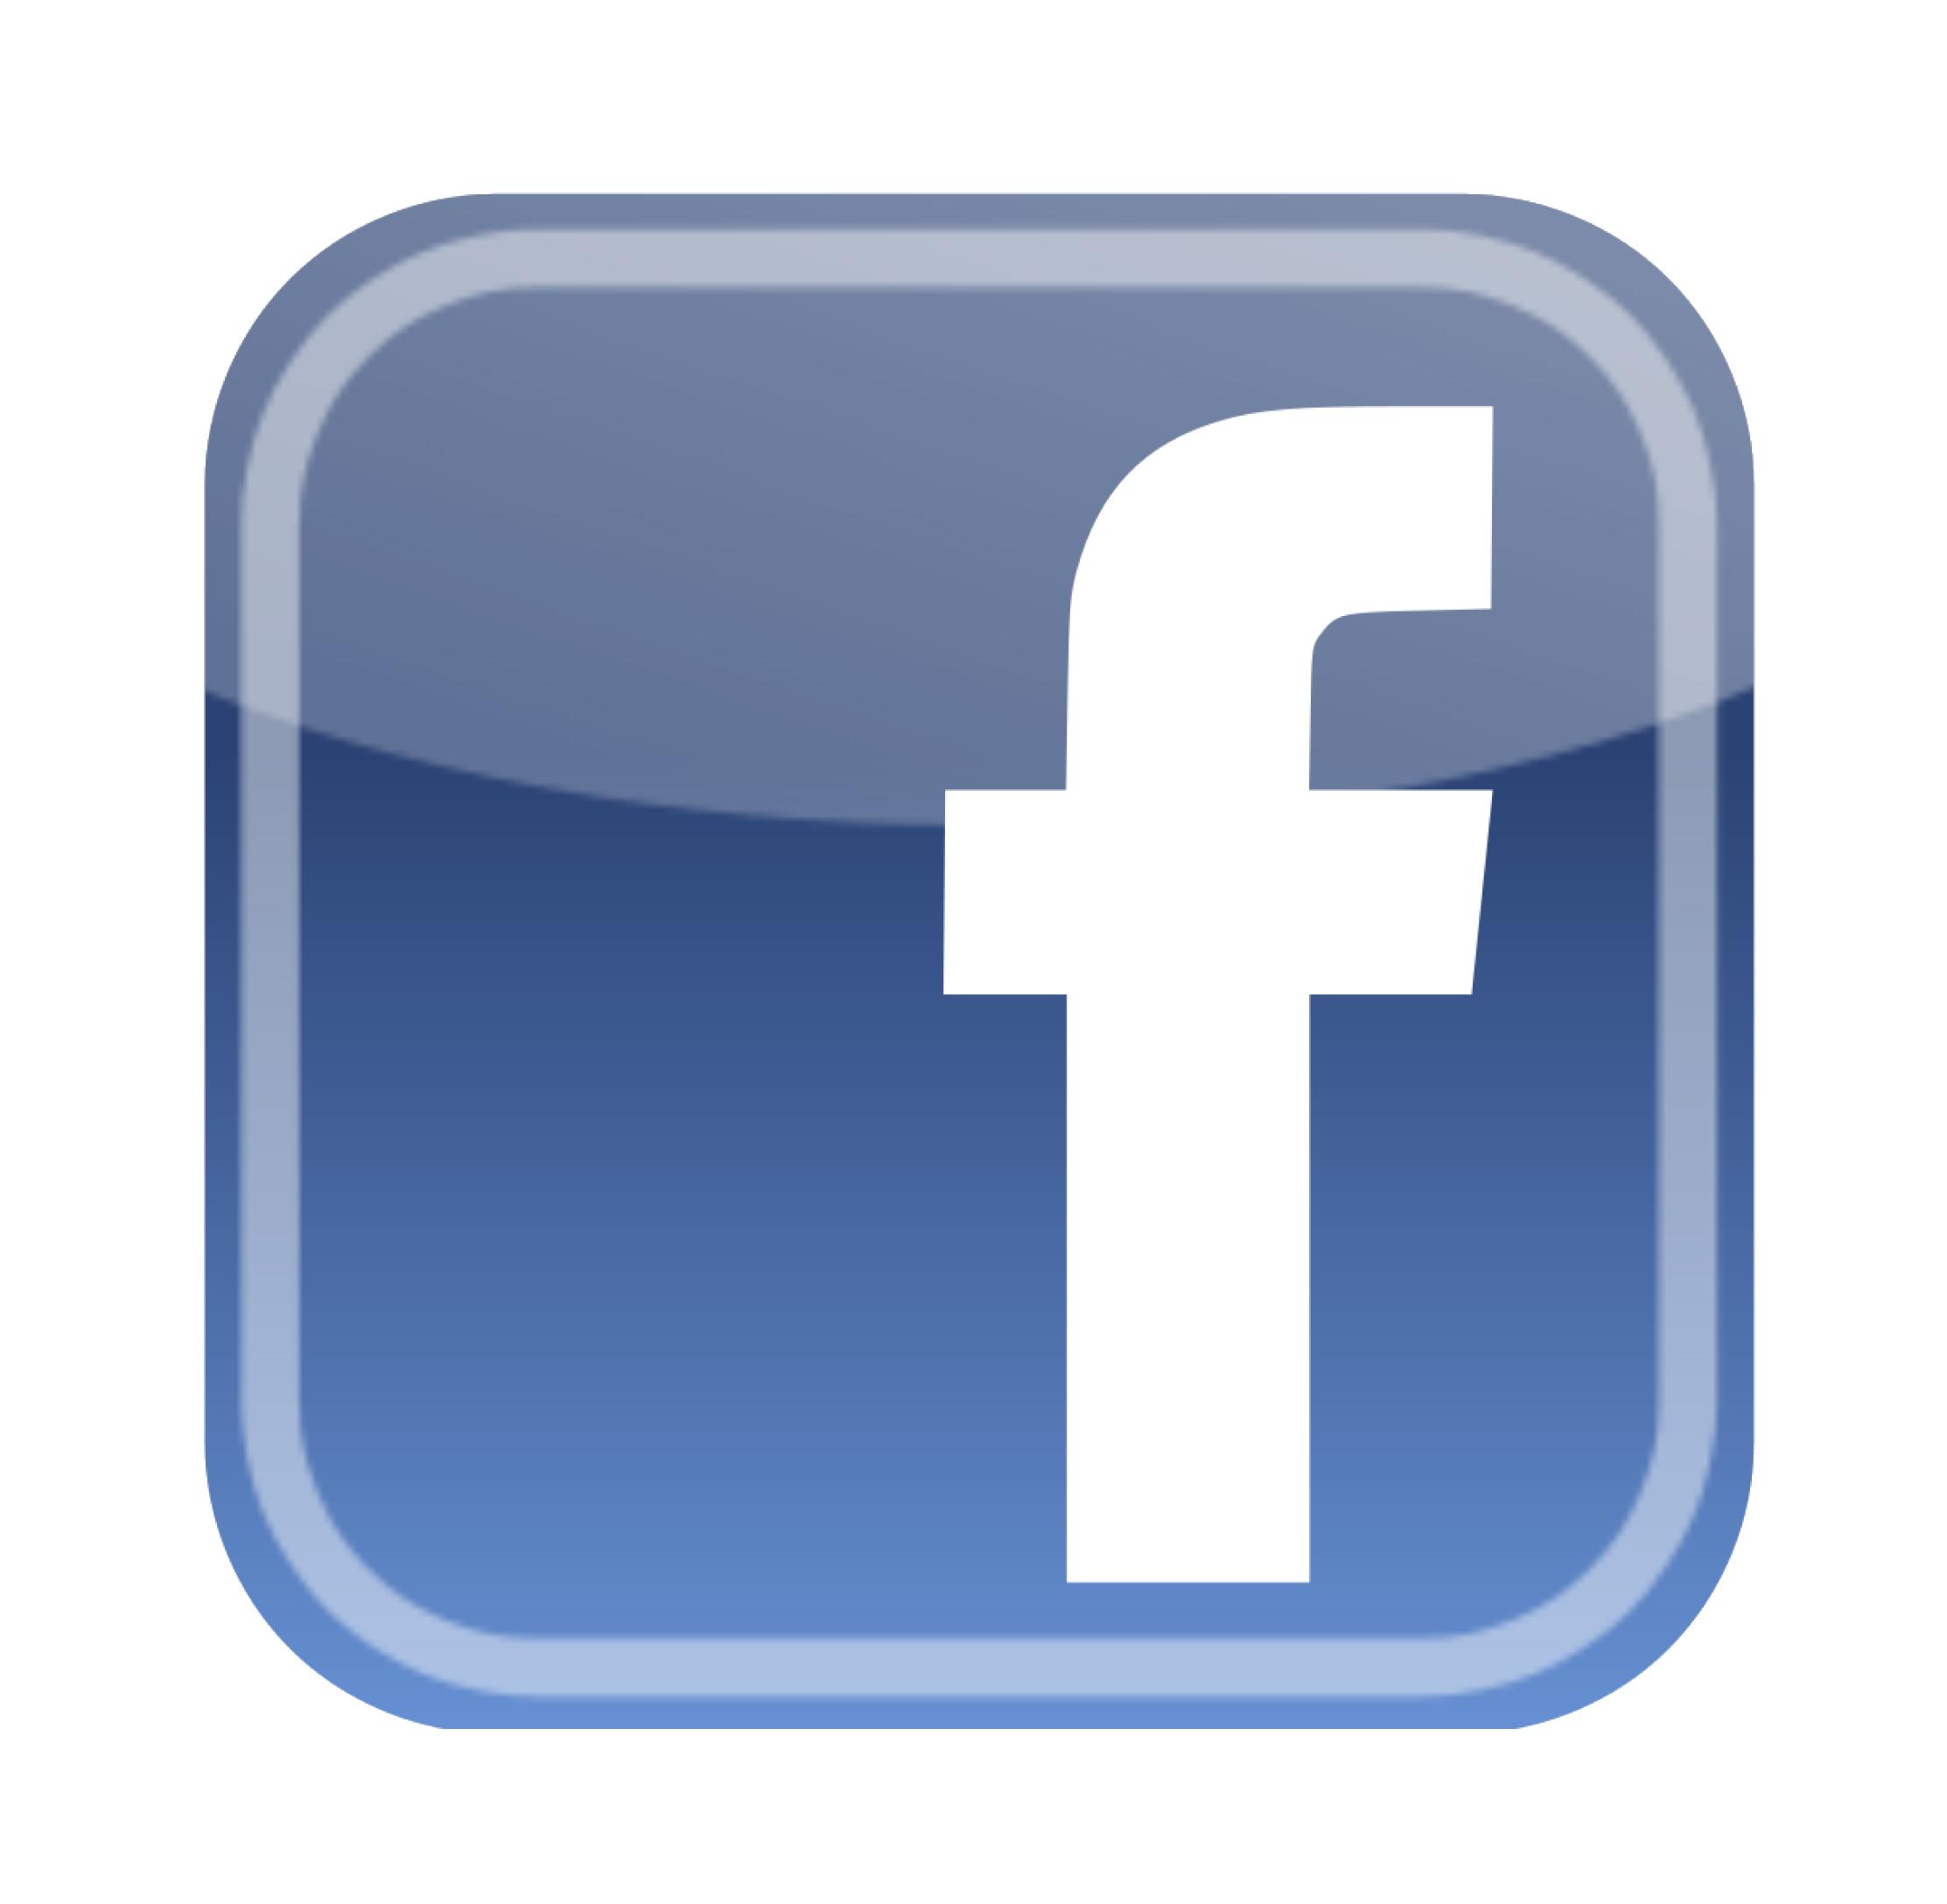 Transparent png pictures free. Facebook clipart logo google